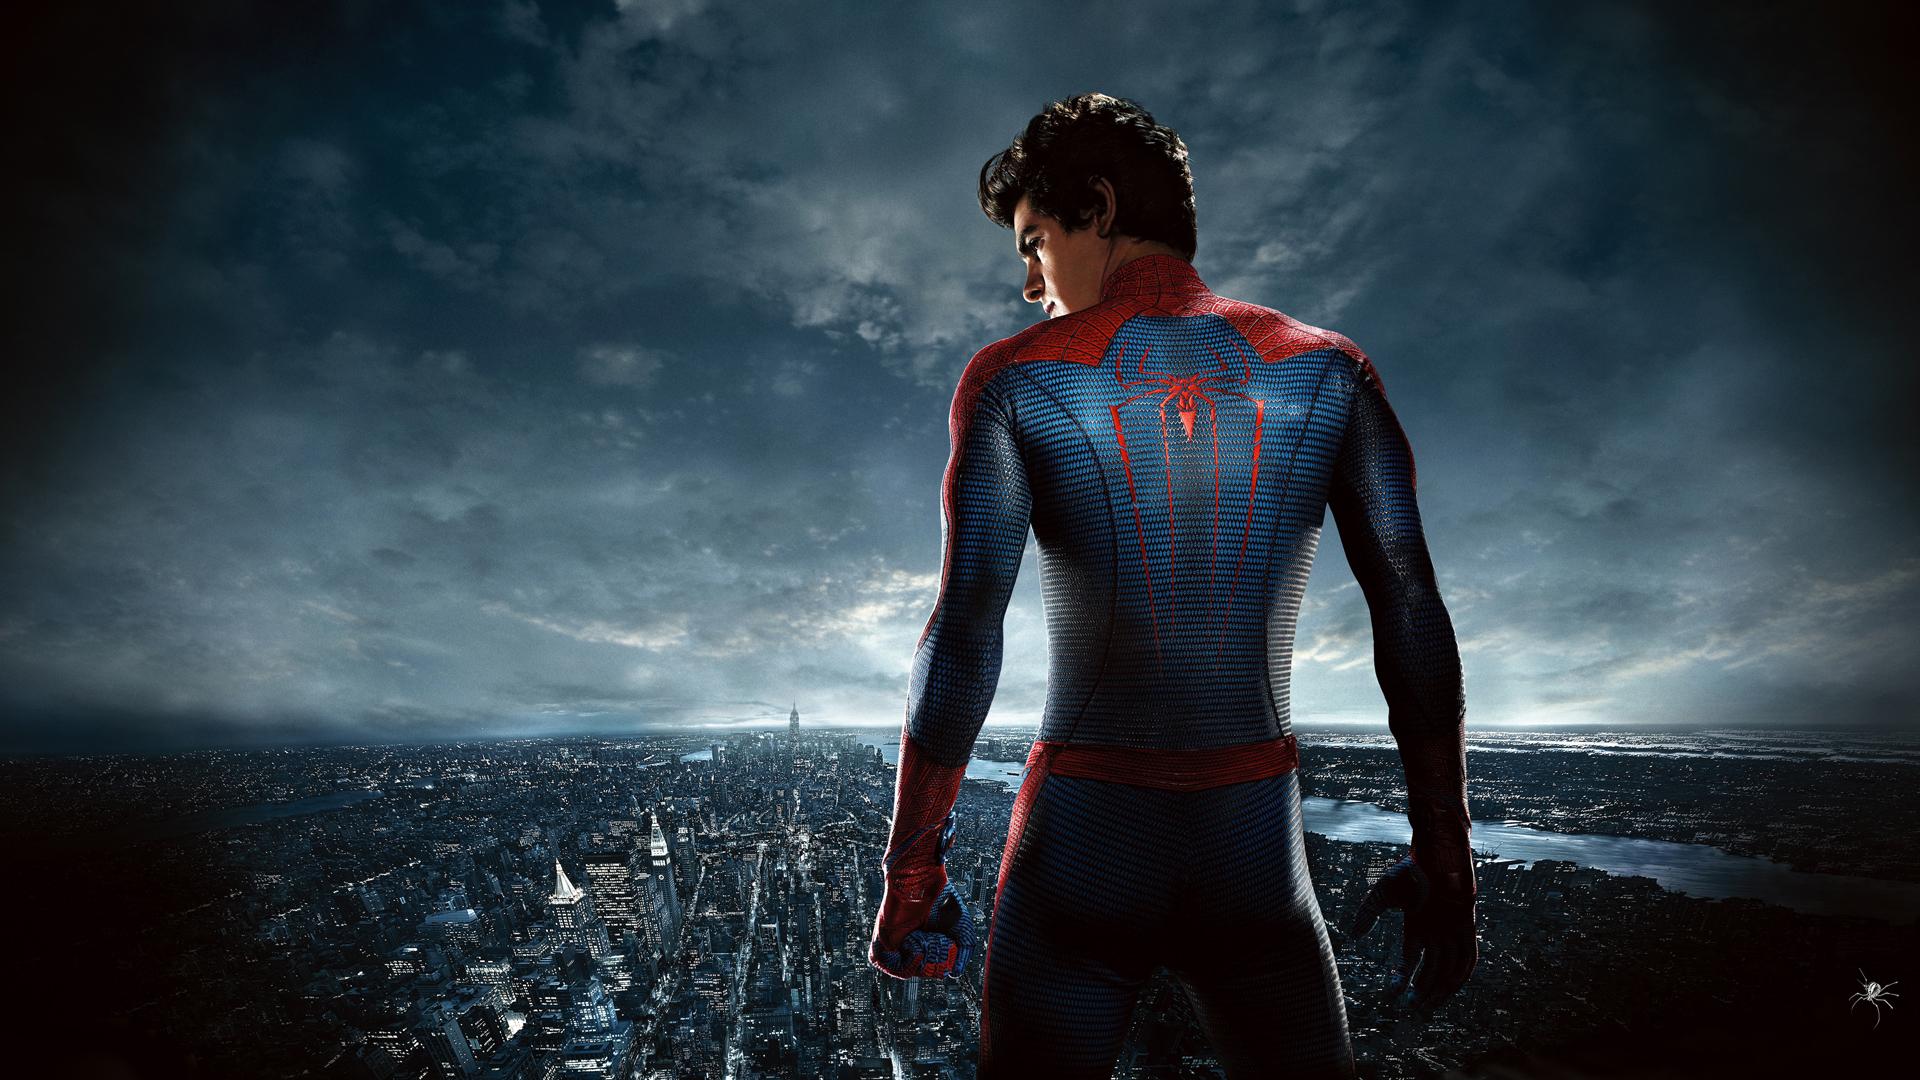 Andrew Garfield Spider Man   Wallpaper High Definition High Quality 1920x1080